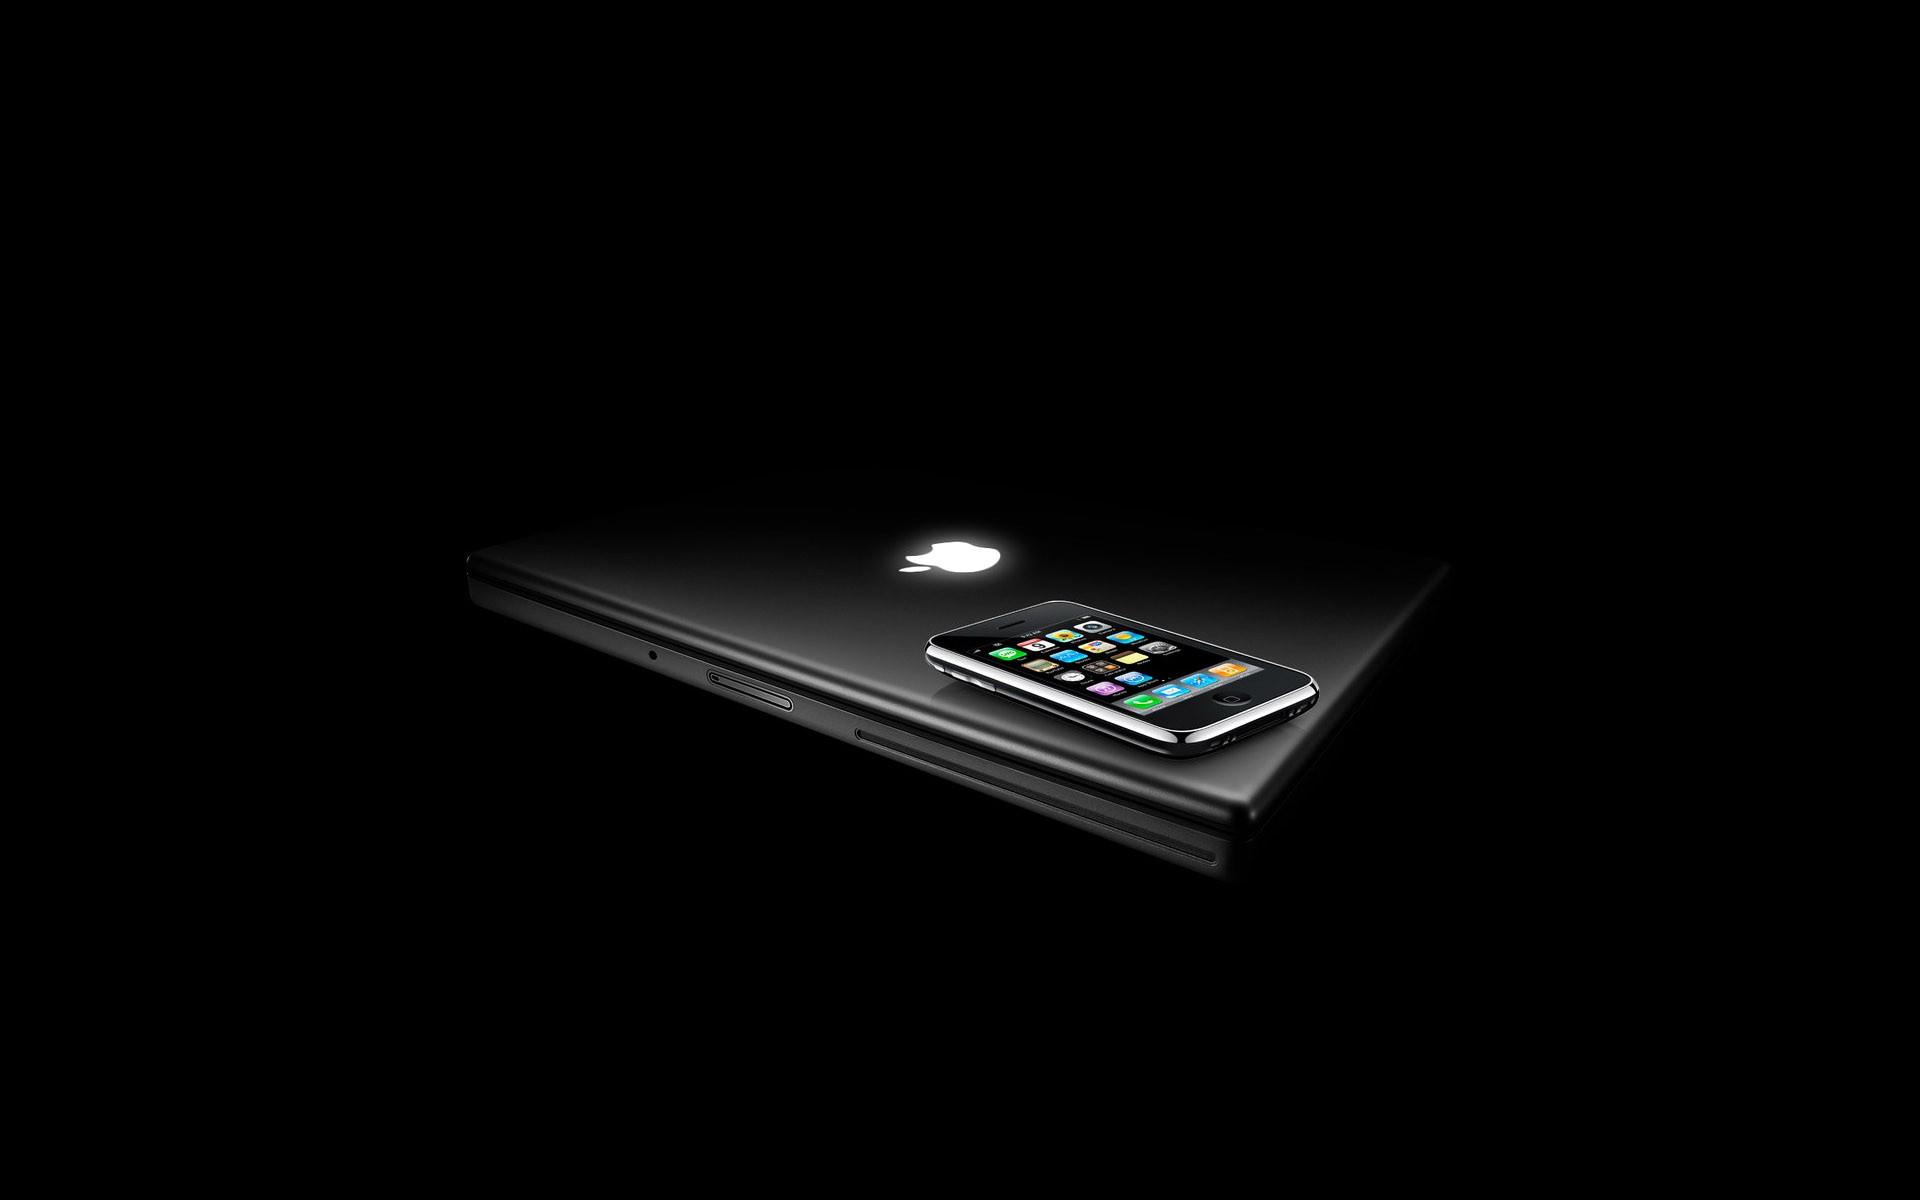 Apple Inc iPhone black background Free Wallpaper WallpaperJam